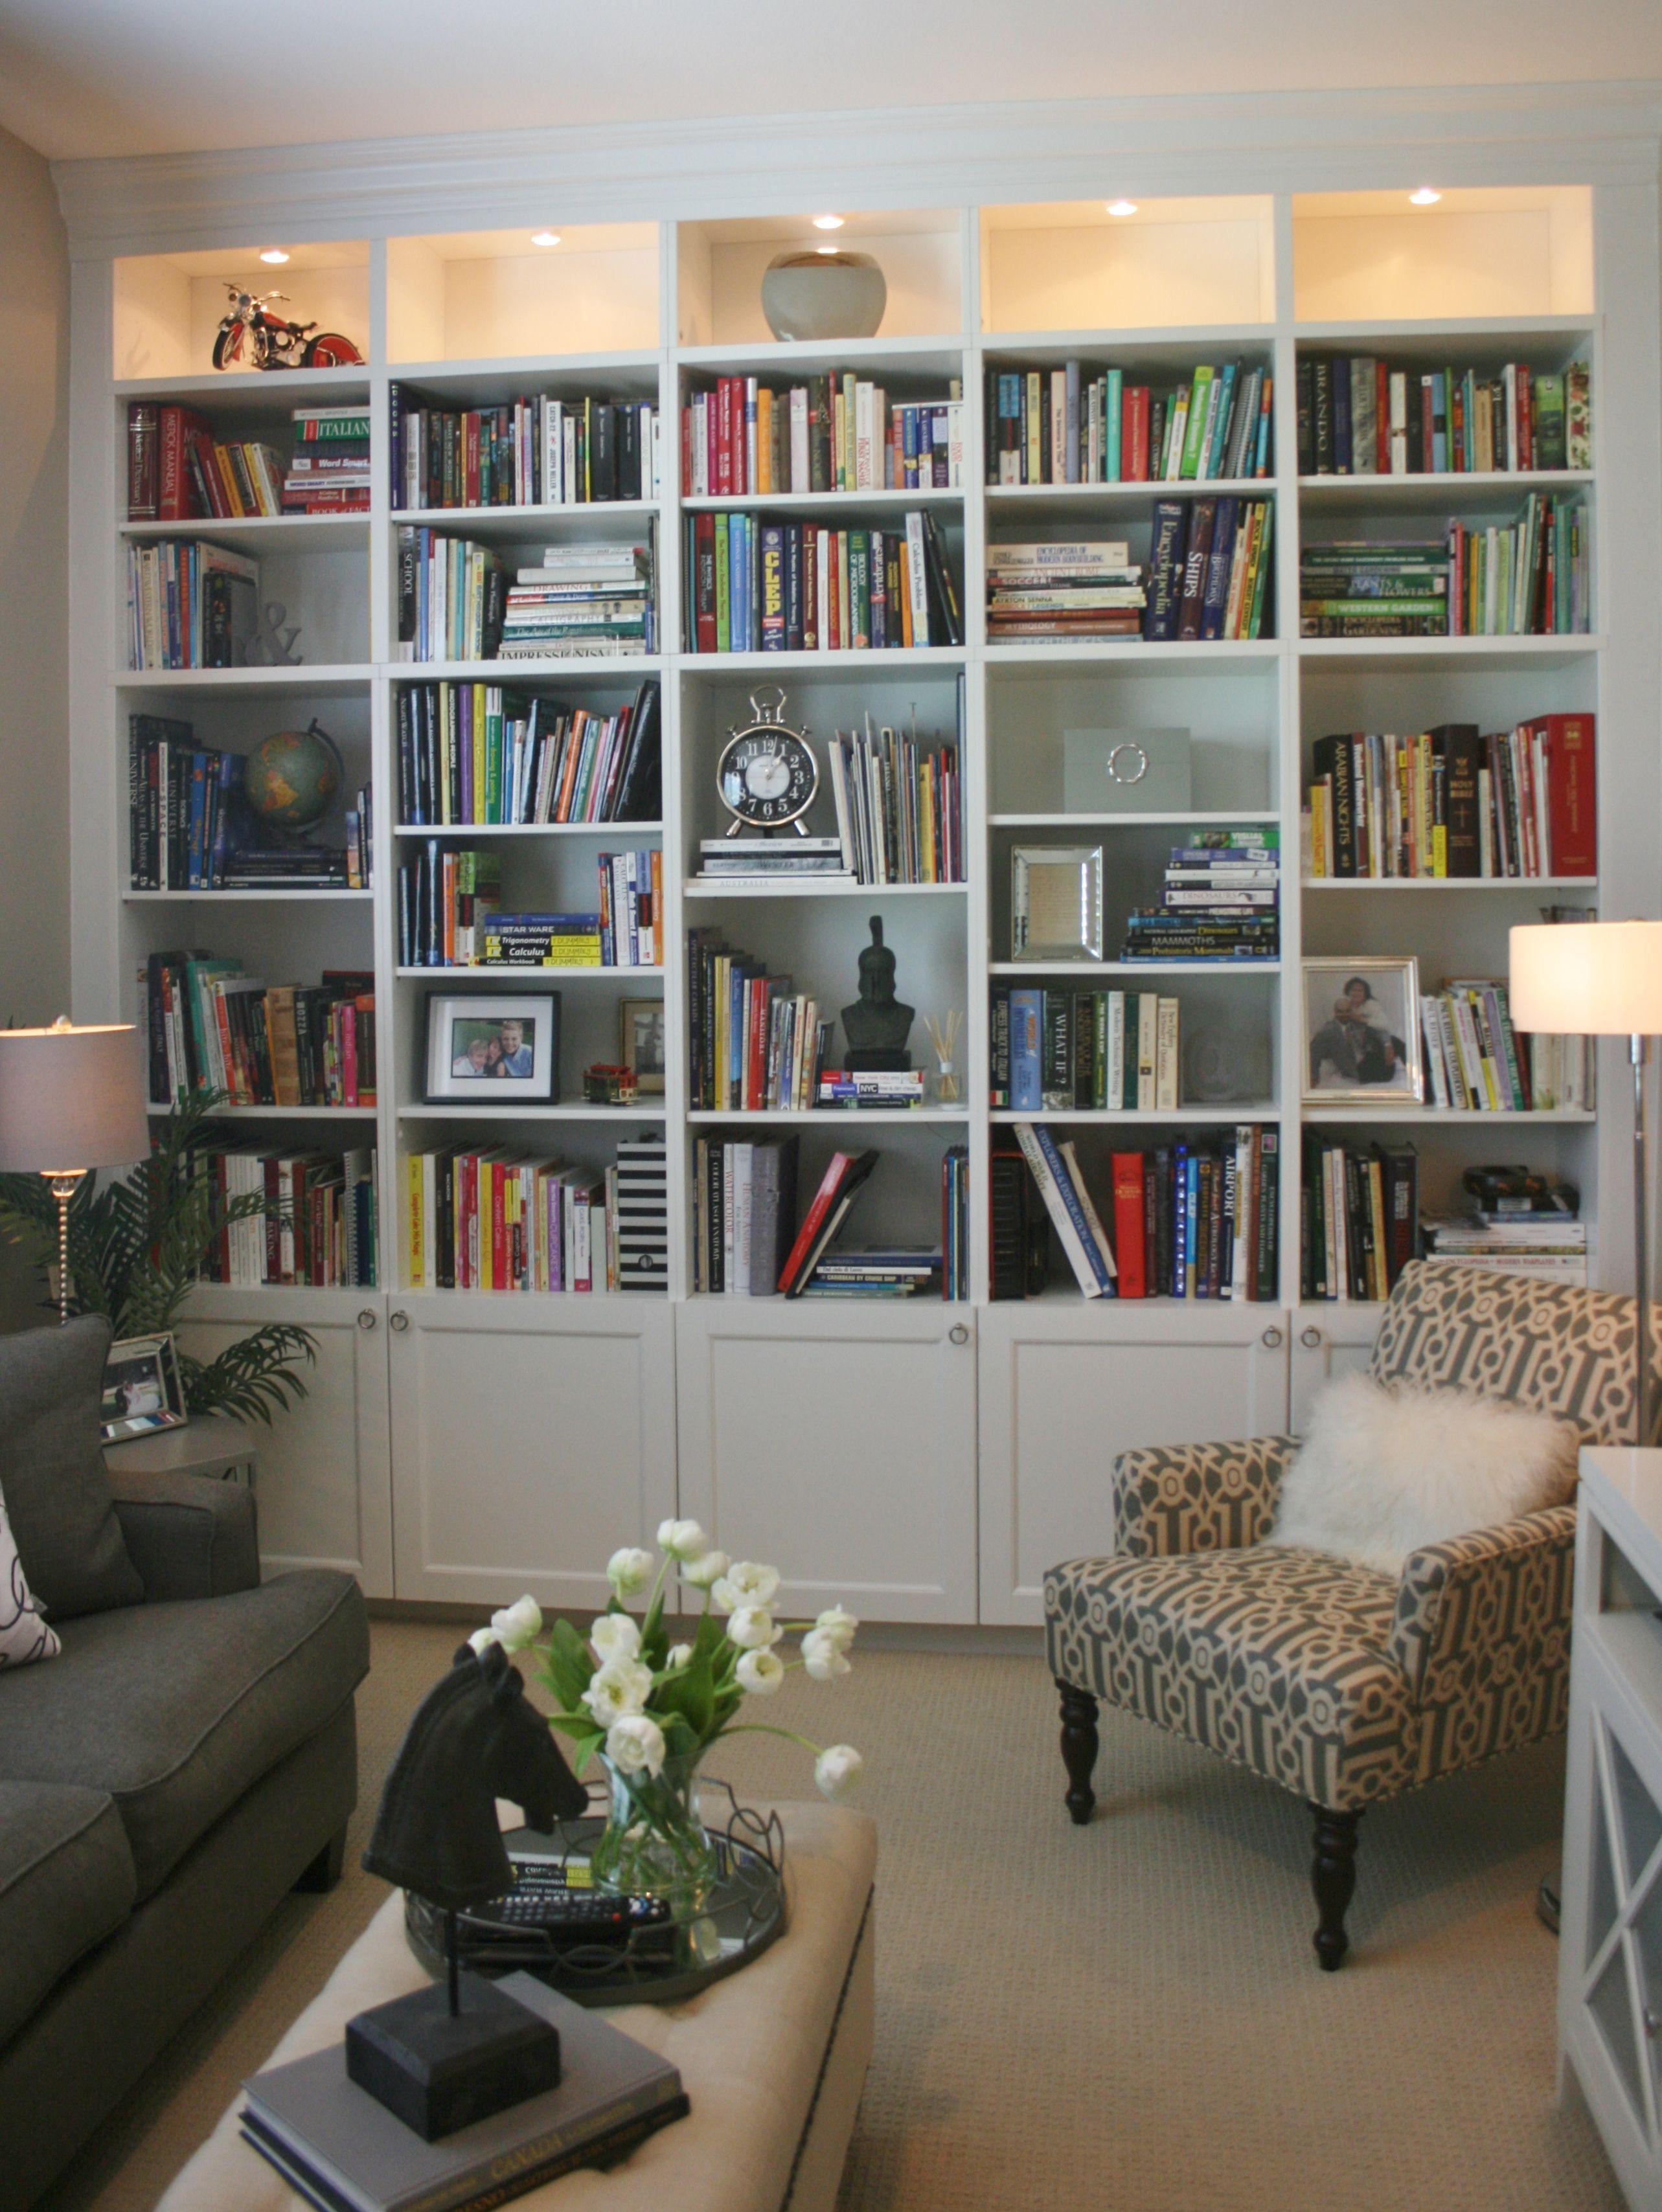 Family Room Bookshelf Decorating Ideas